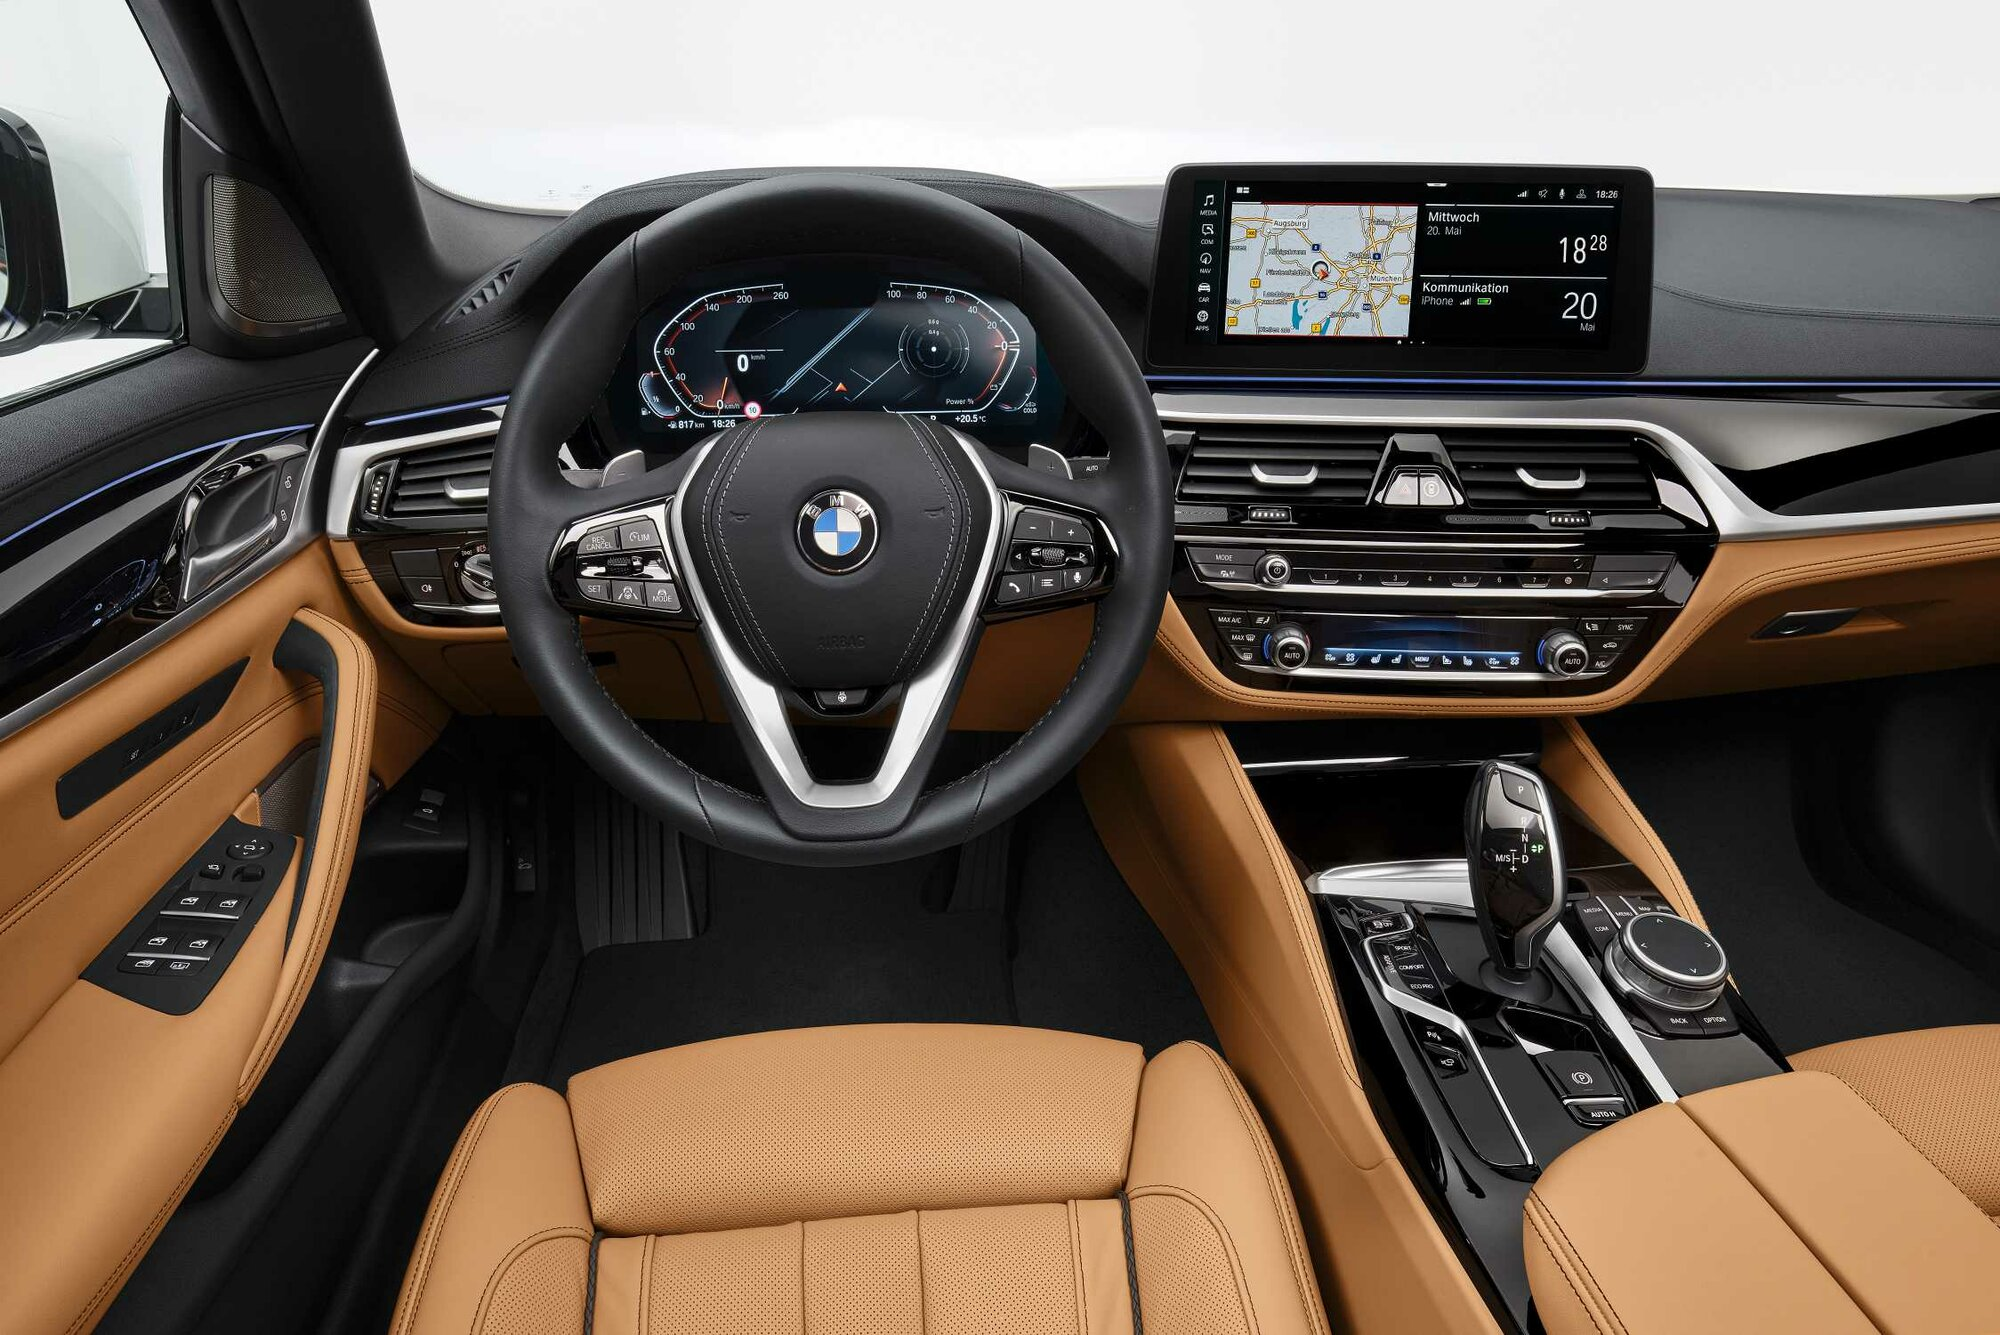 P90389075-the-new-bmw-540i-sedan-mineralwhite-metallic-05-2020-2248px.jpg